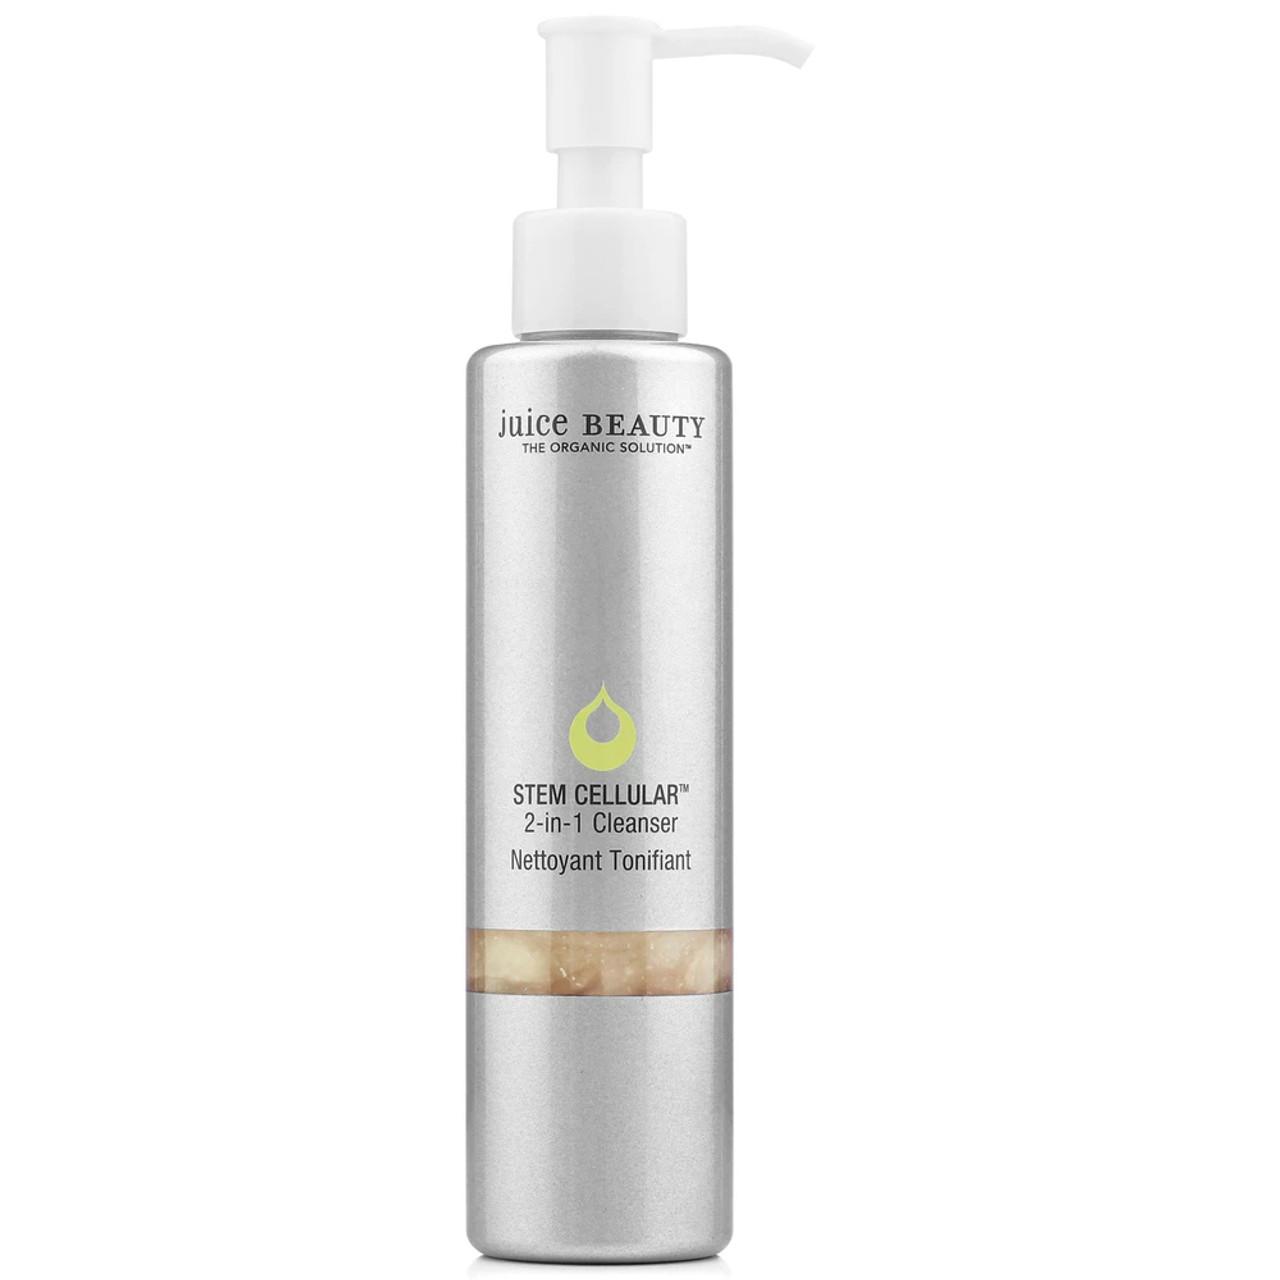 Juice Beauty Cellular 2-in-1 Cleanser BeautifiedYou.com